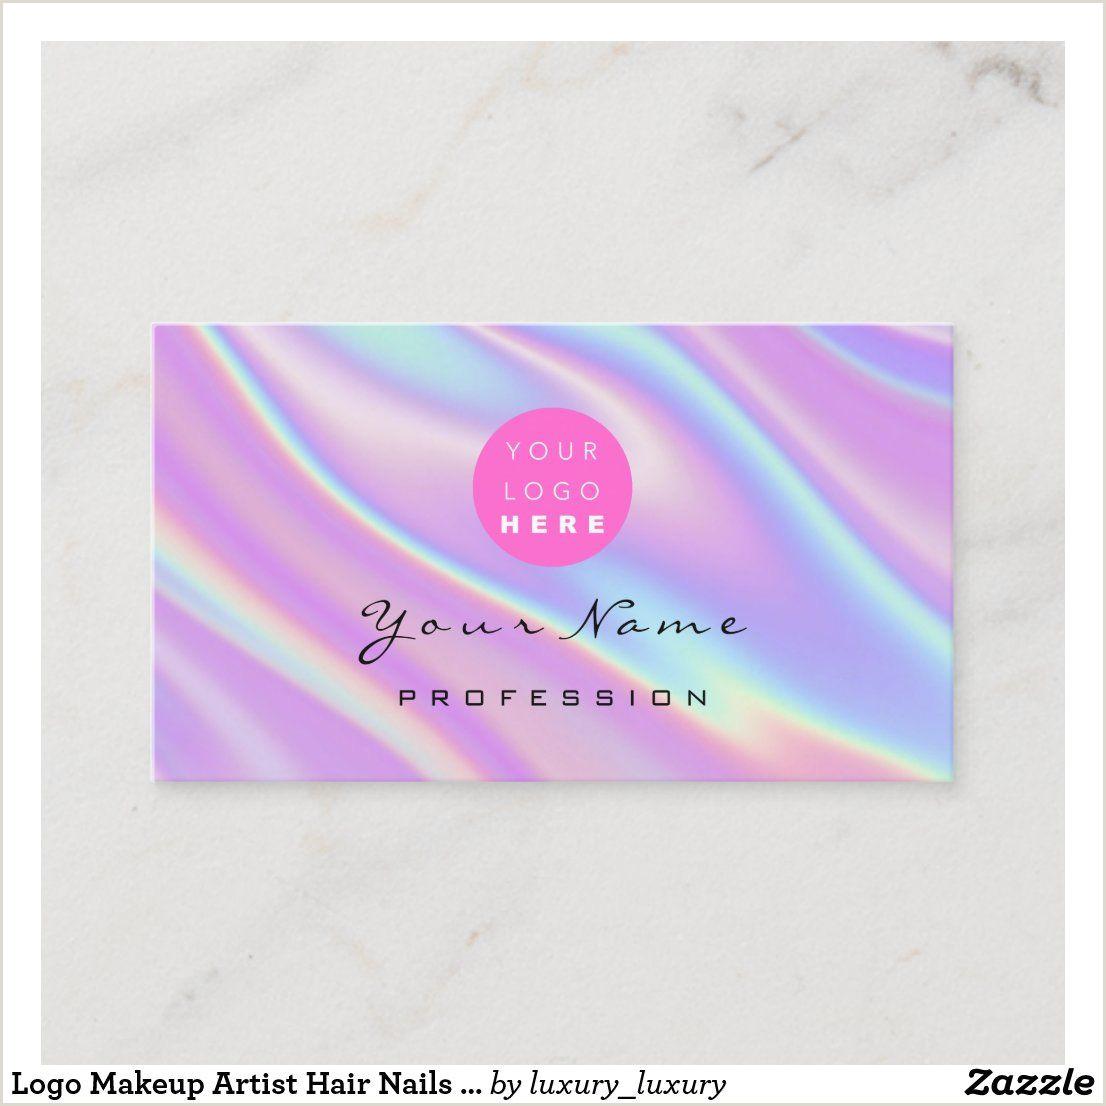 Makeup Business Card Ideas Logo Makeup Artist Hair Nails Holograph Abstract Business